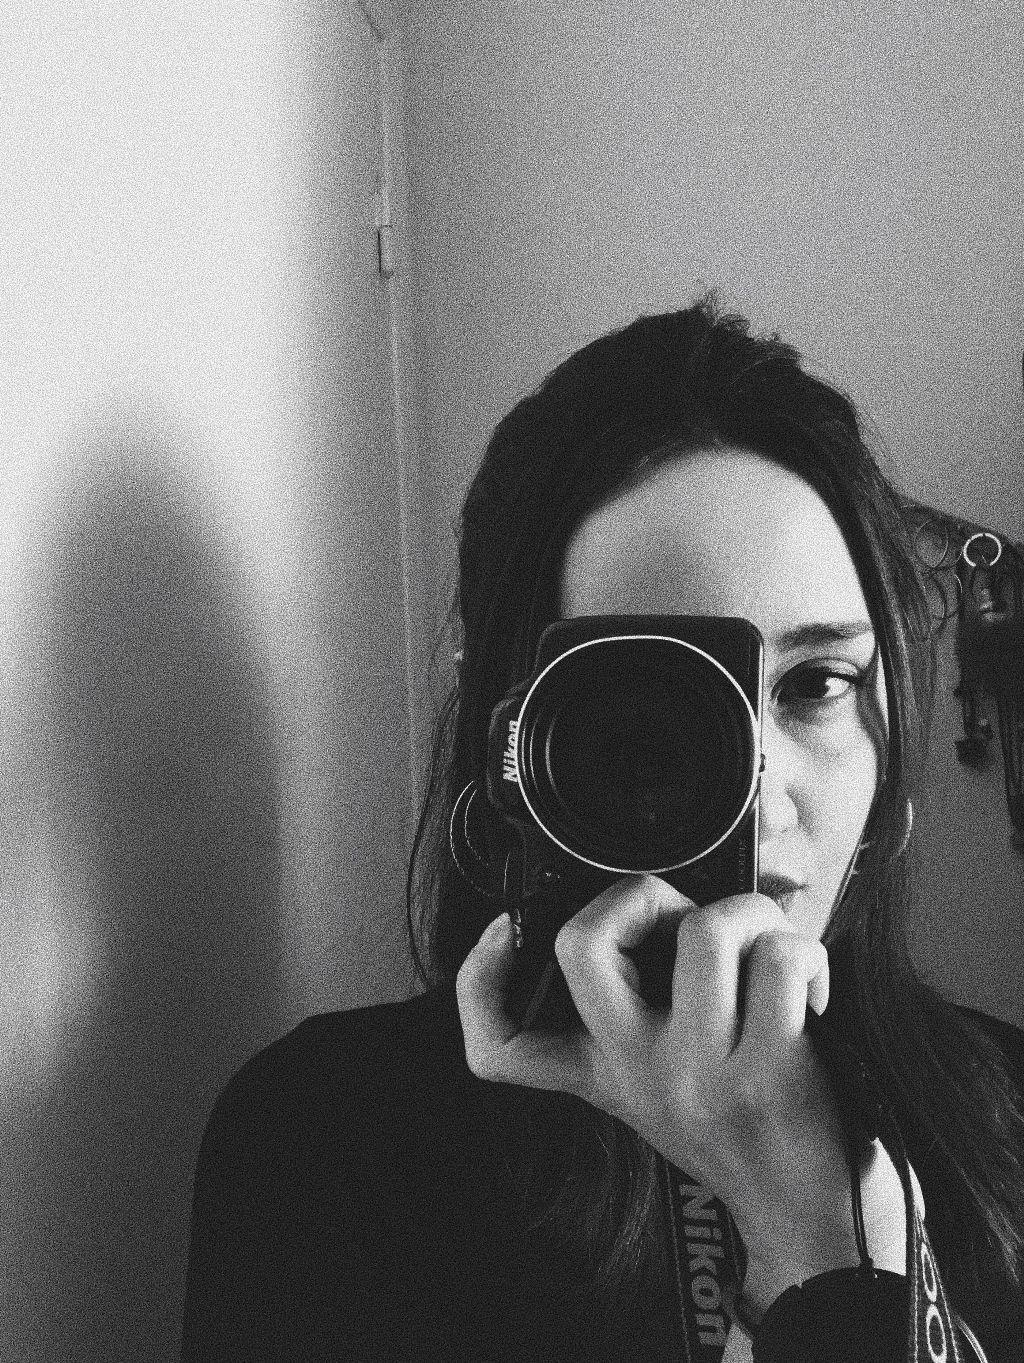 #freetoedit #photography #camera #girl #blackandwhite #grain